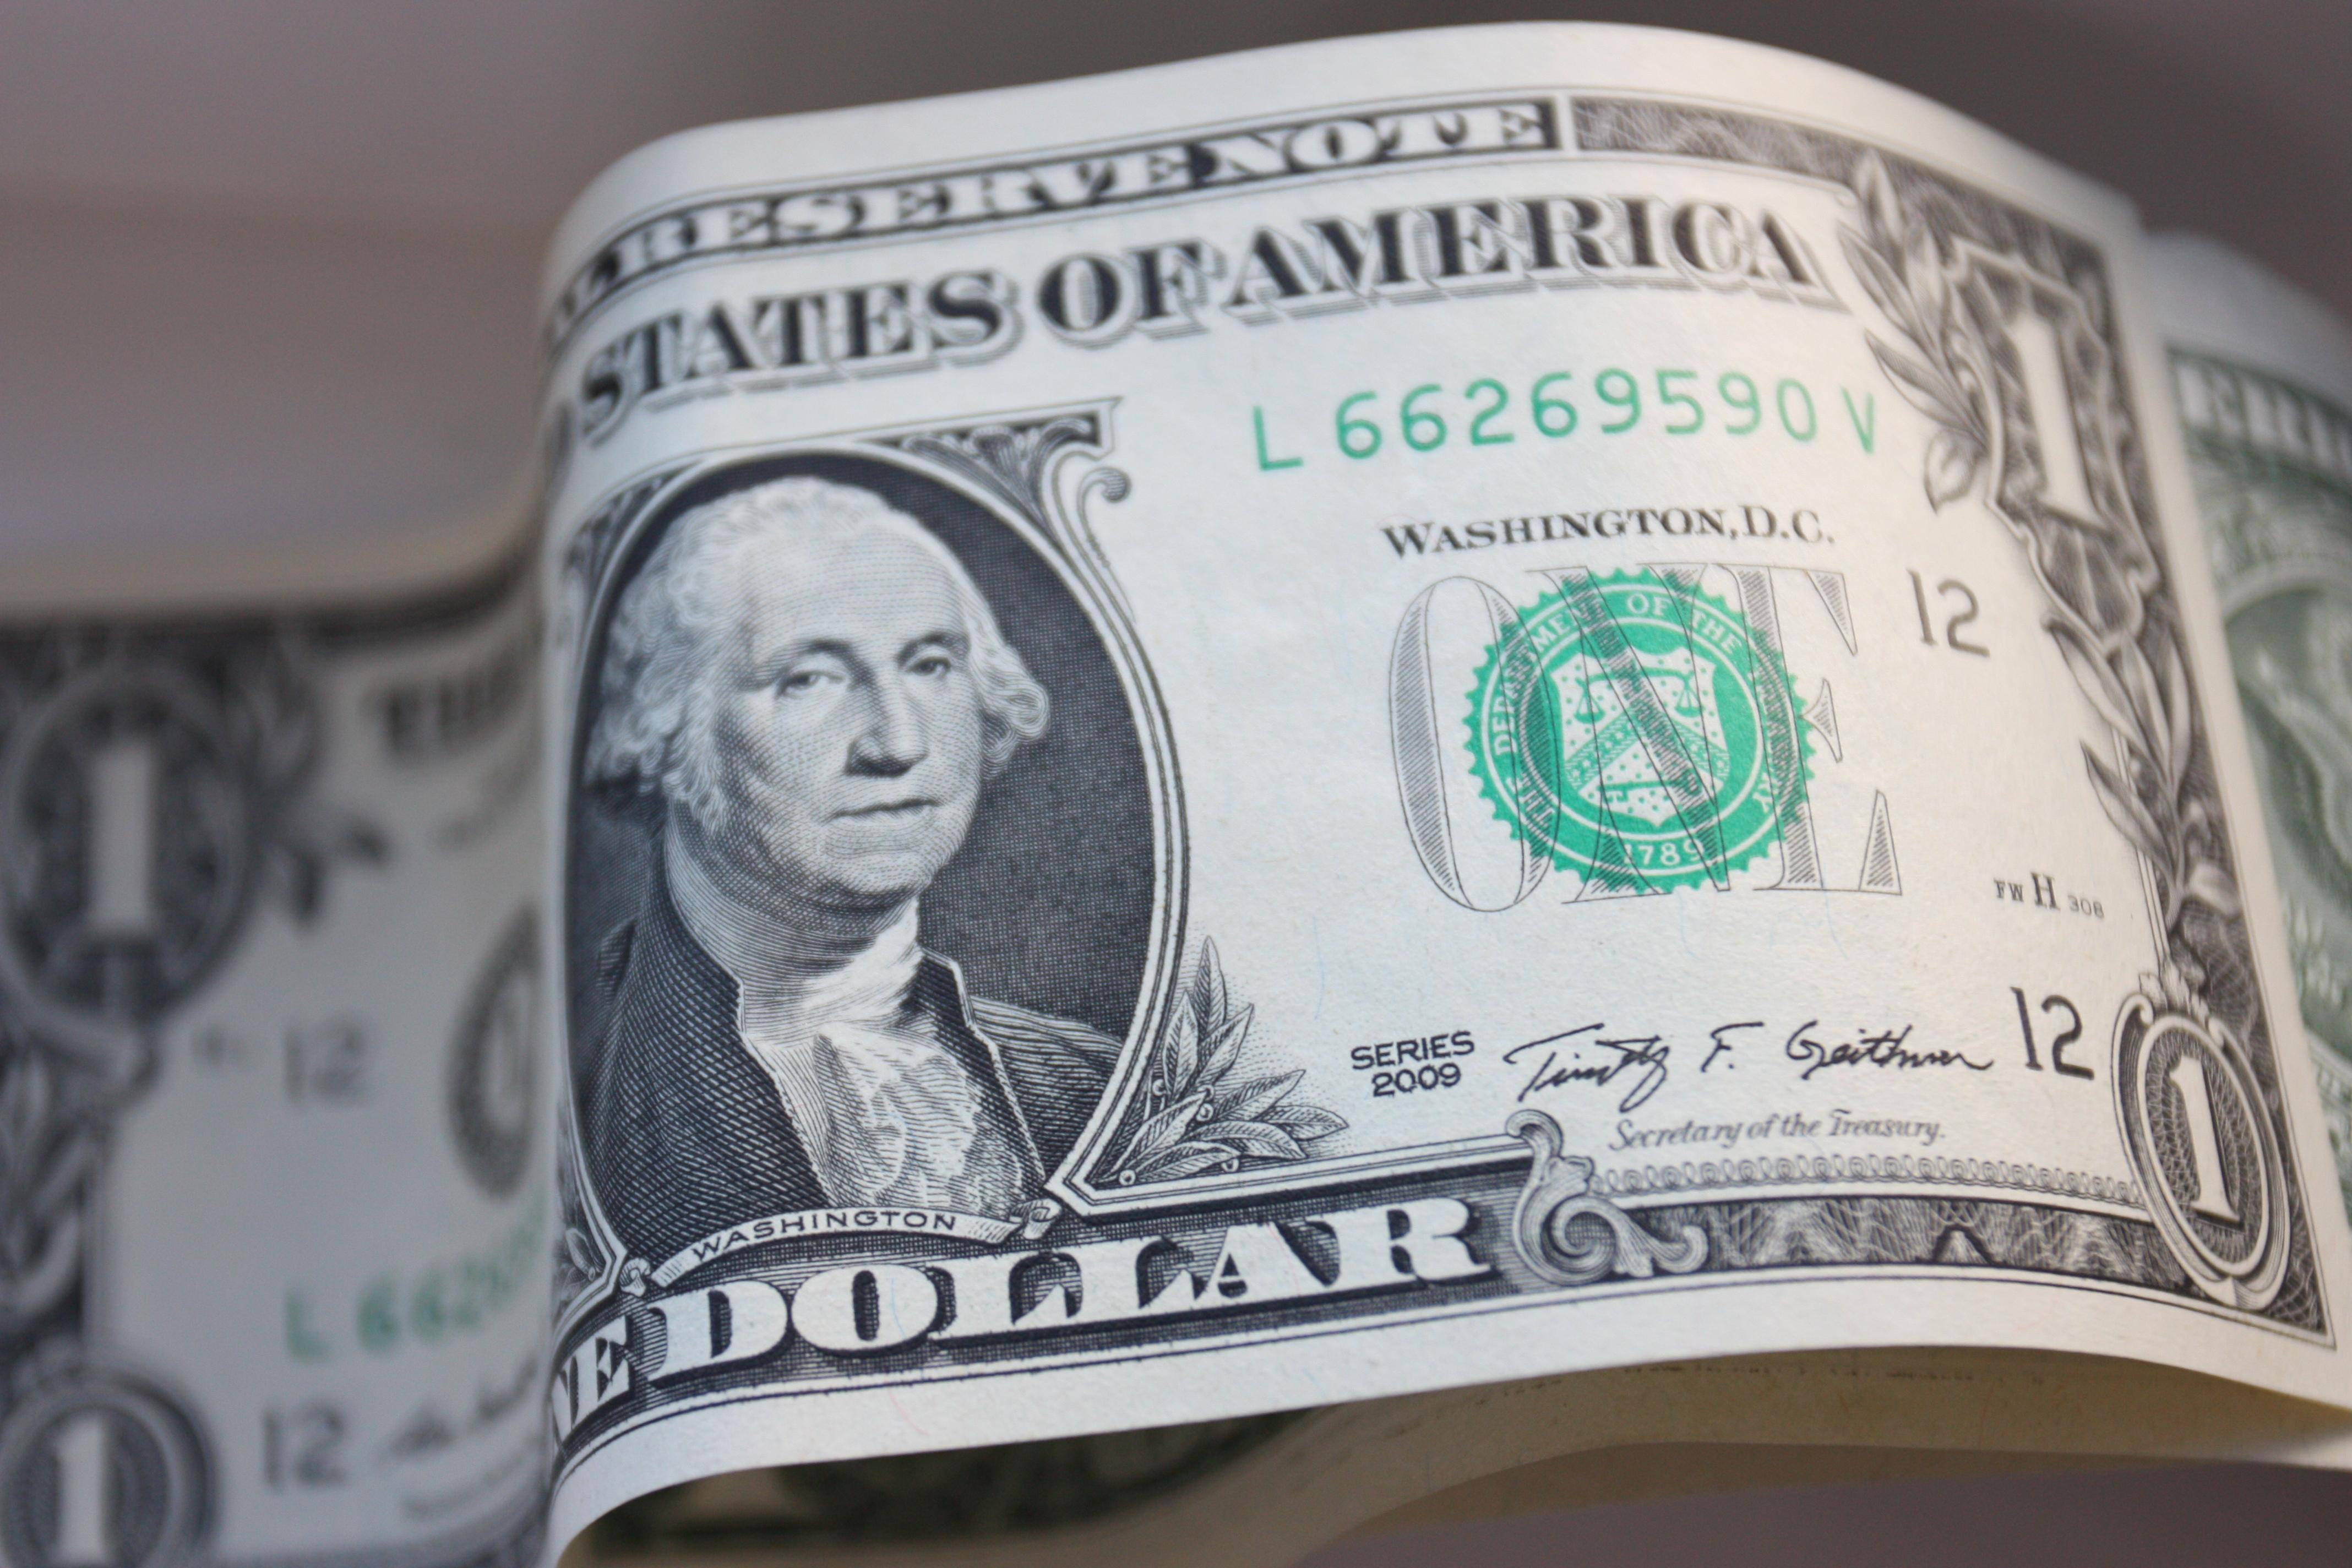 Сколько стоит евро и доллар 10 января, прогноз курса валют на завтра